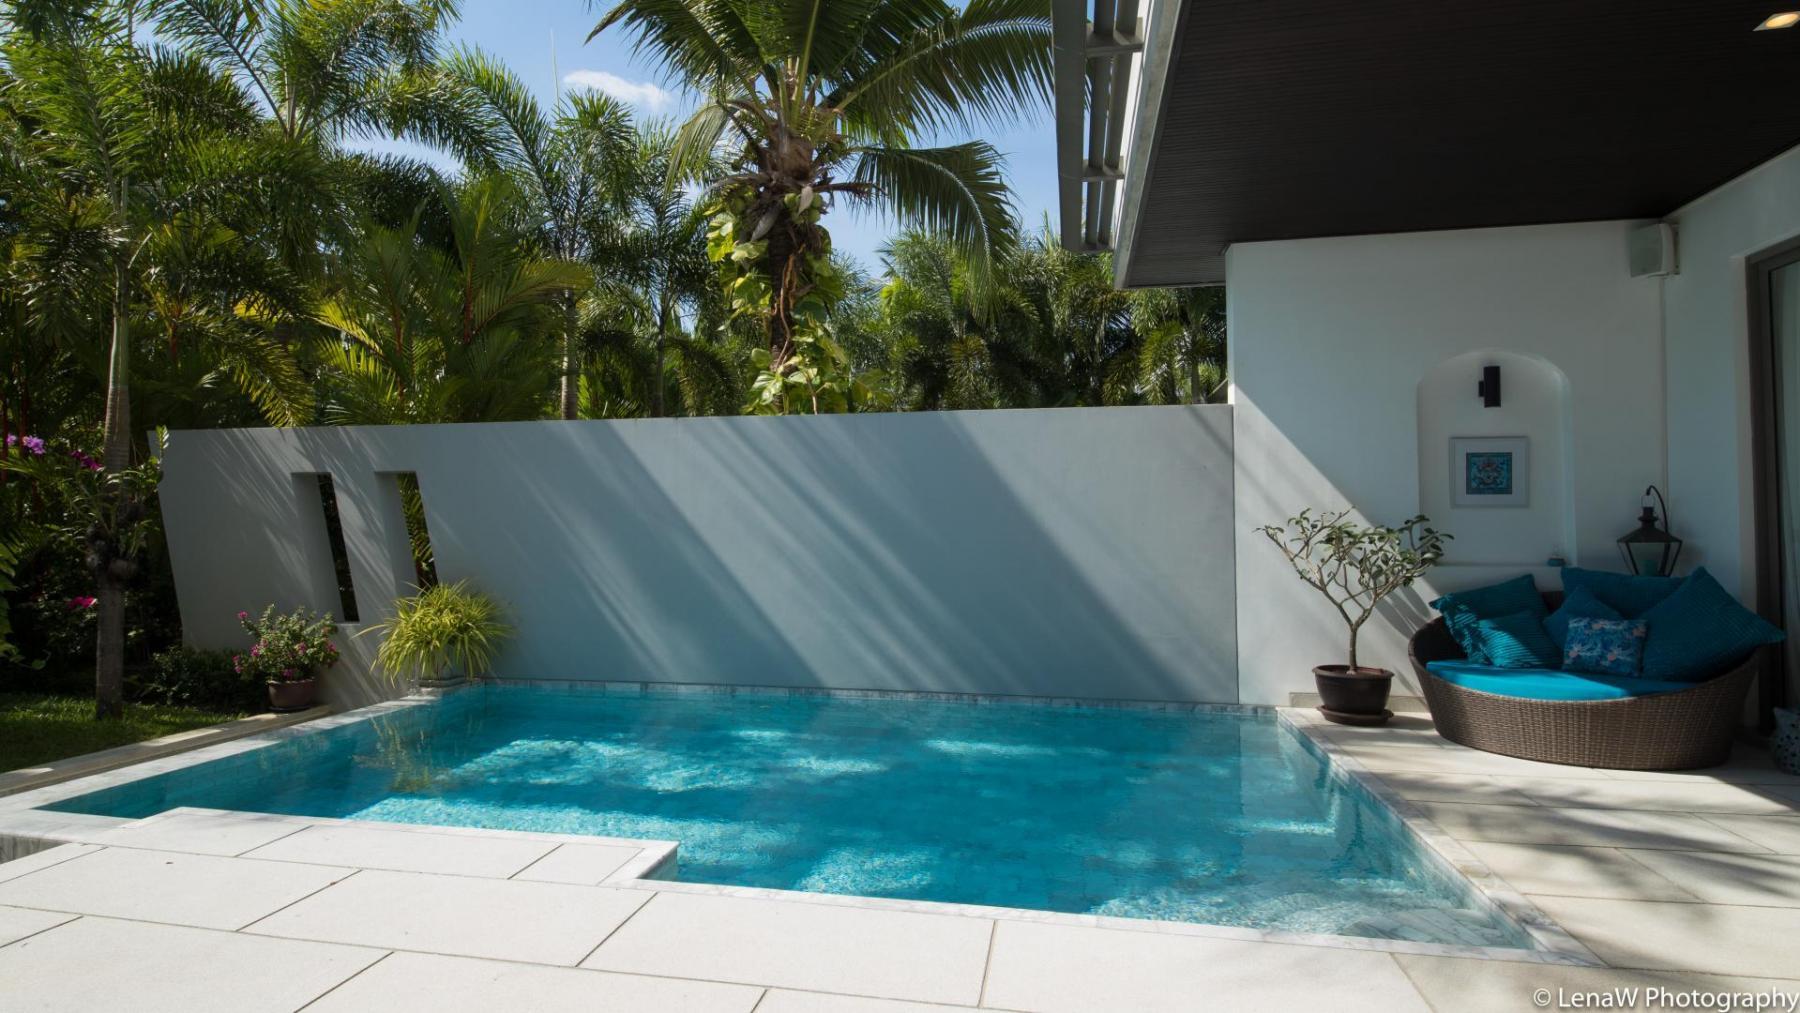 Luxury-Real-Estate-Properties-Phuket-Homes-For-Sale-Thailand-jpg-4